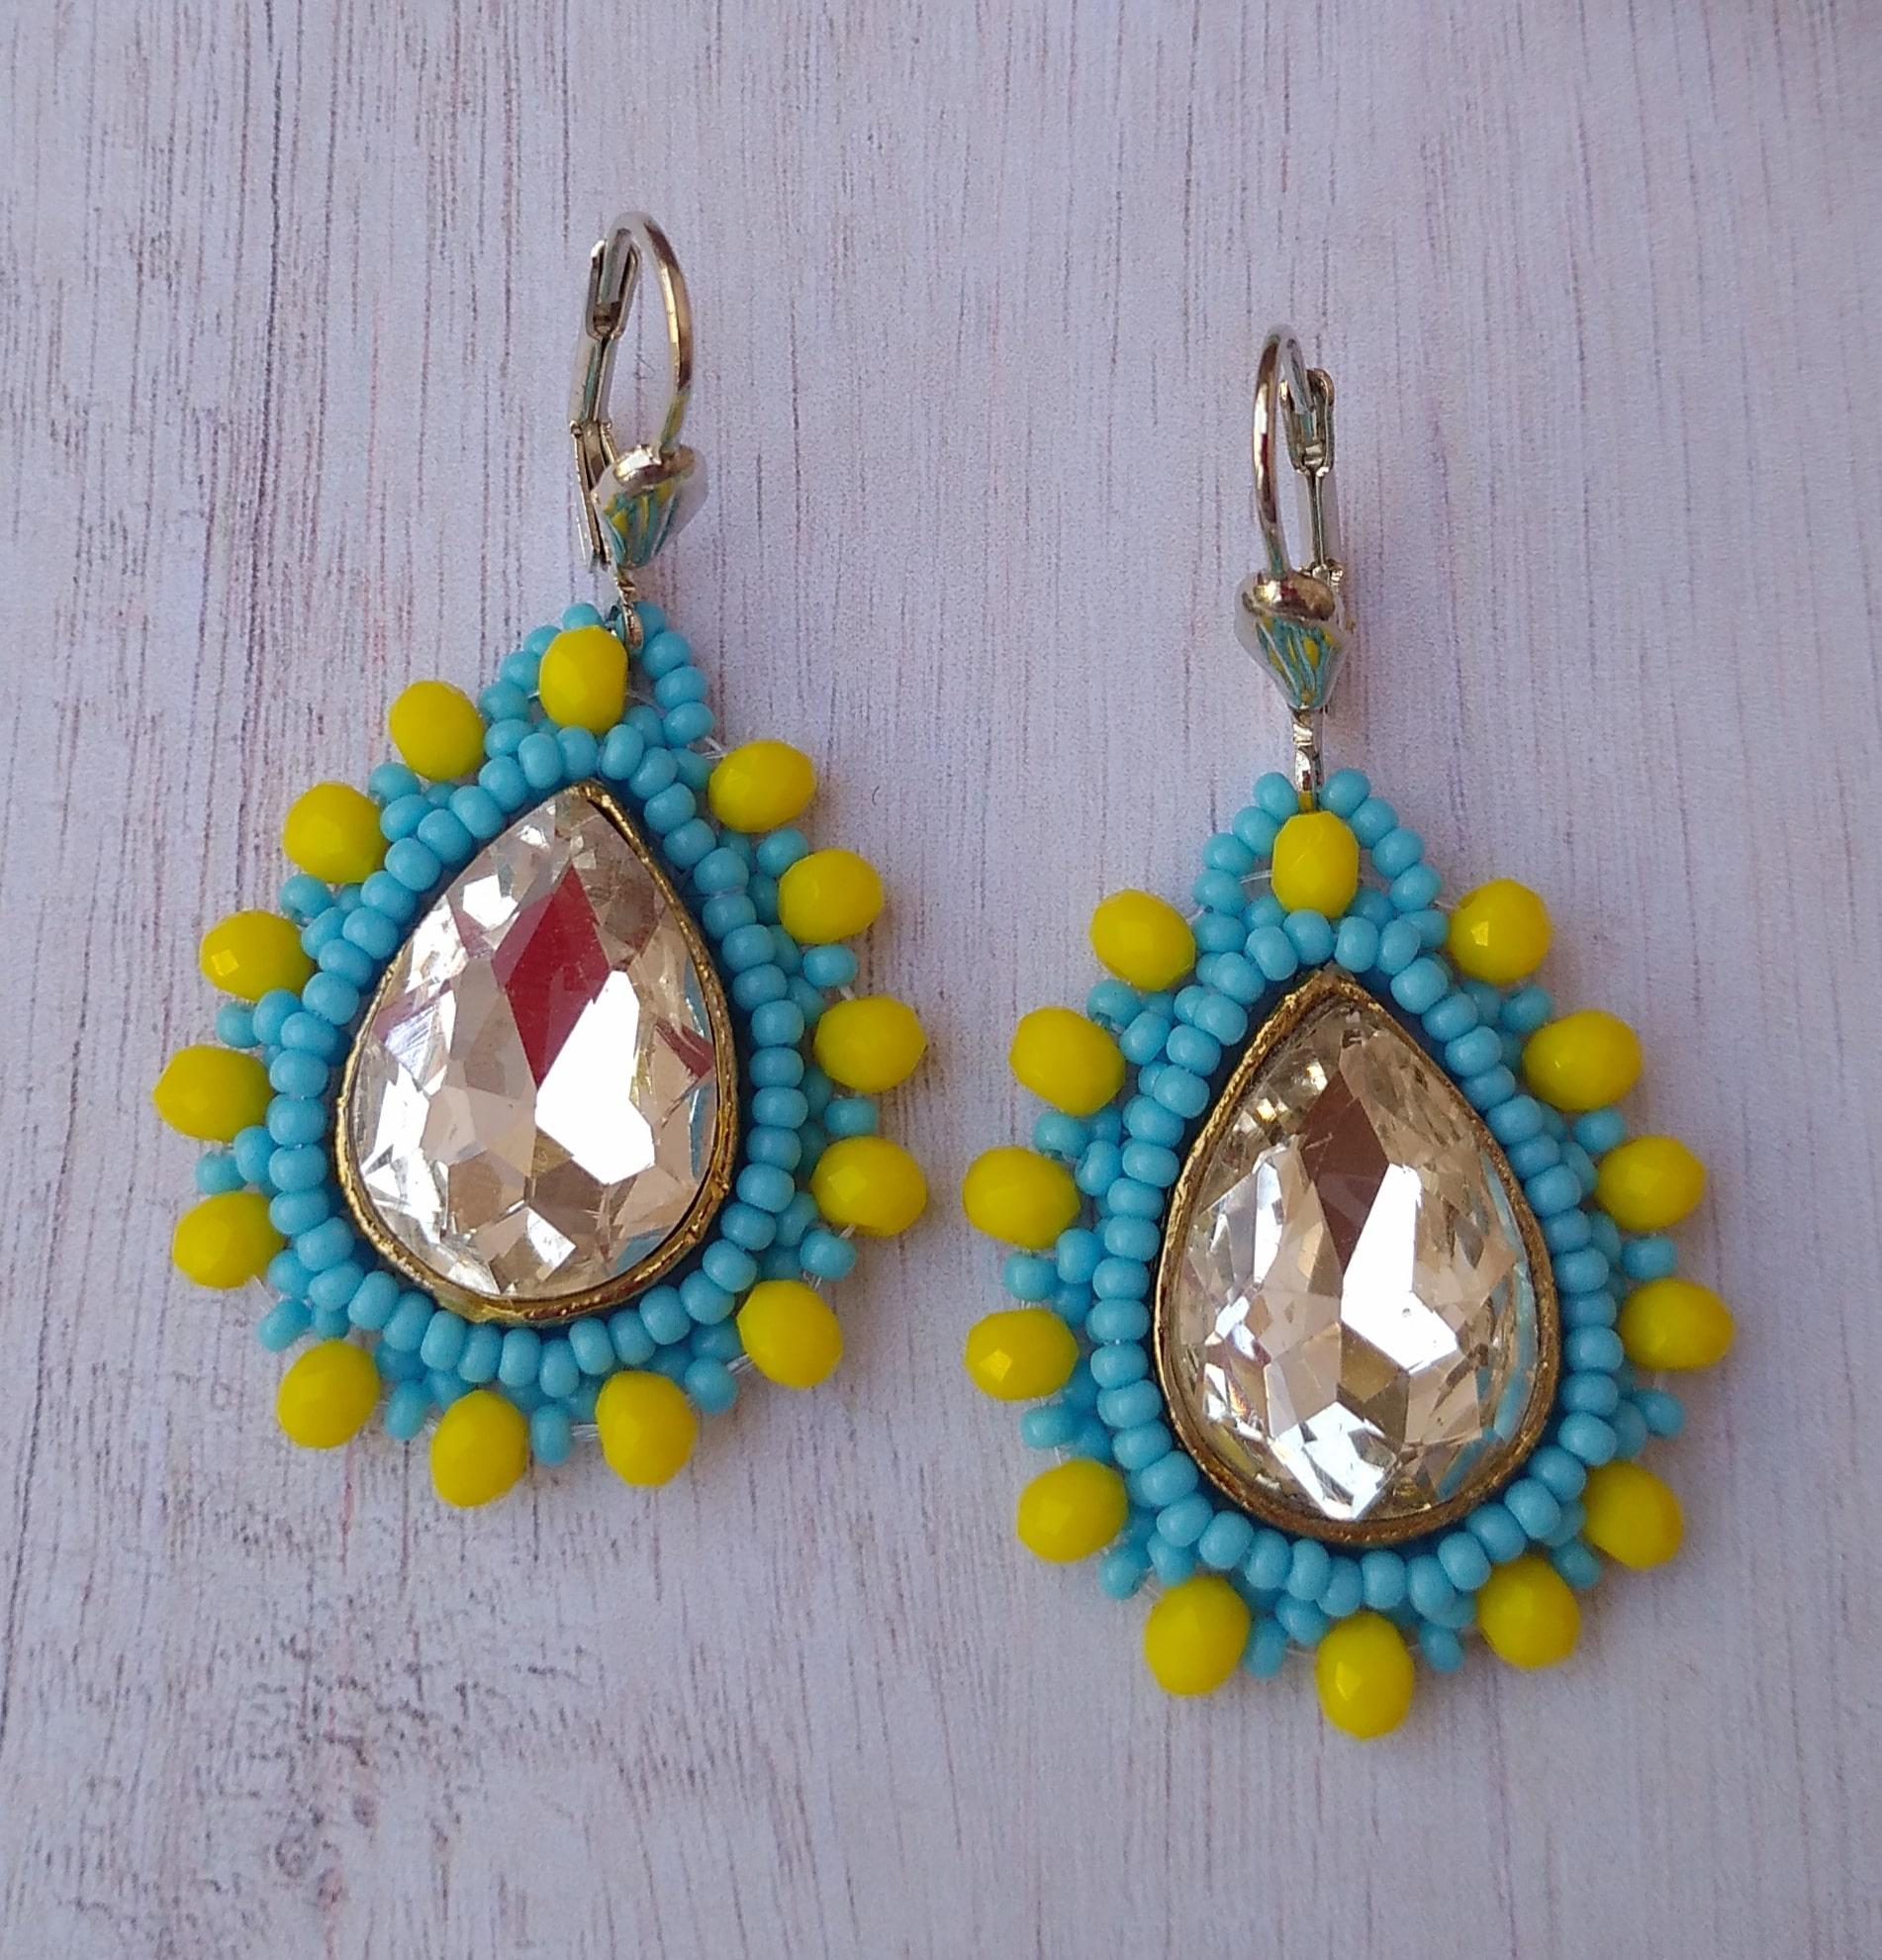 Women's Beaded Drop Earrings with Glittering Stone Work Slider Thumbnail 3/4